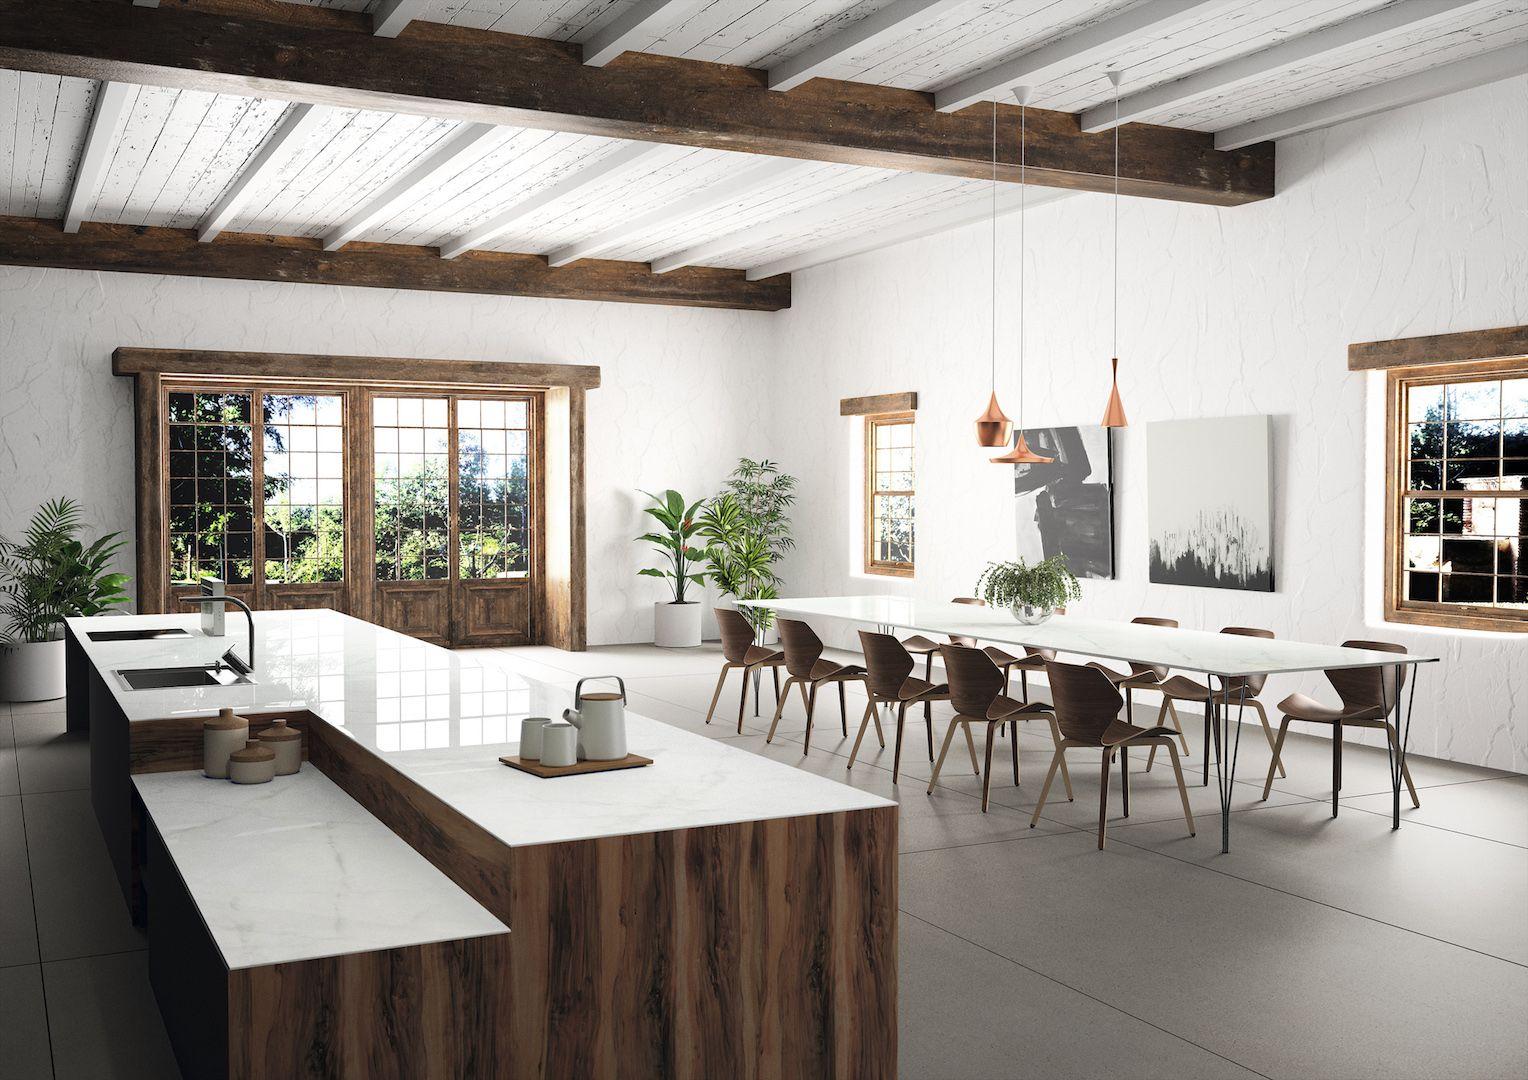 Keukenblad dekton xgloss tundra keuken werkbladen gespot door